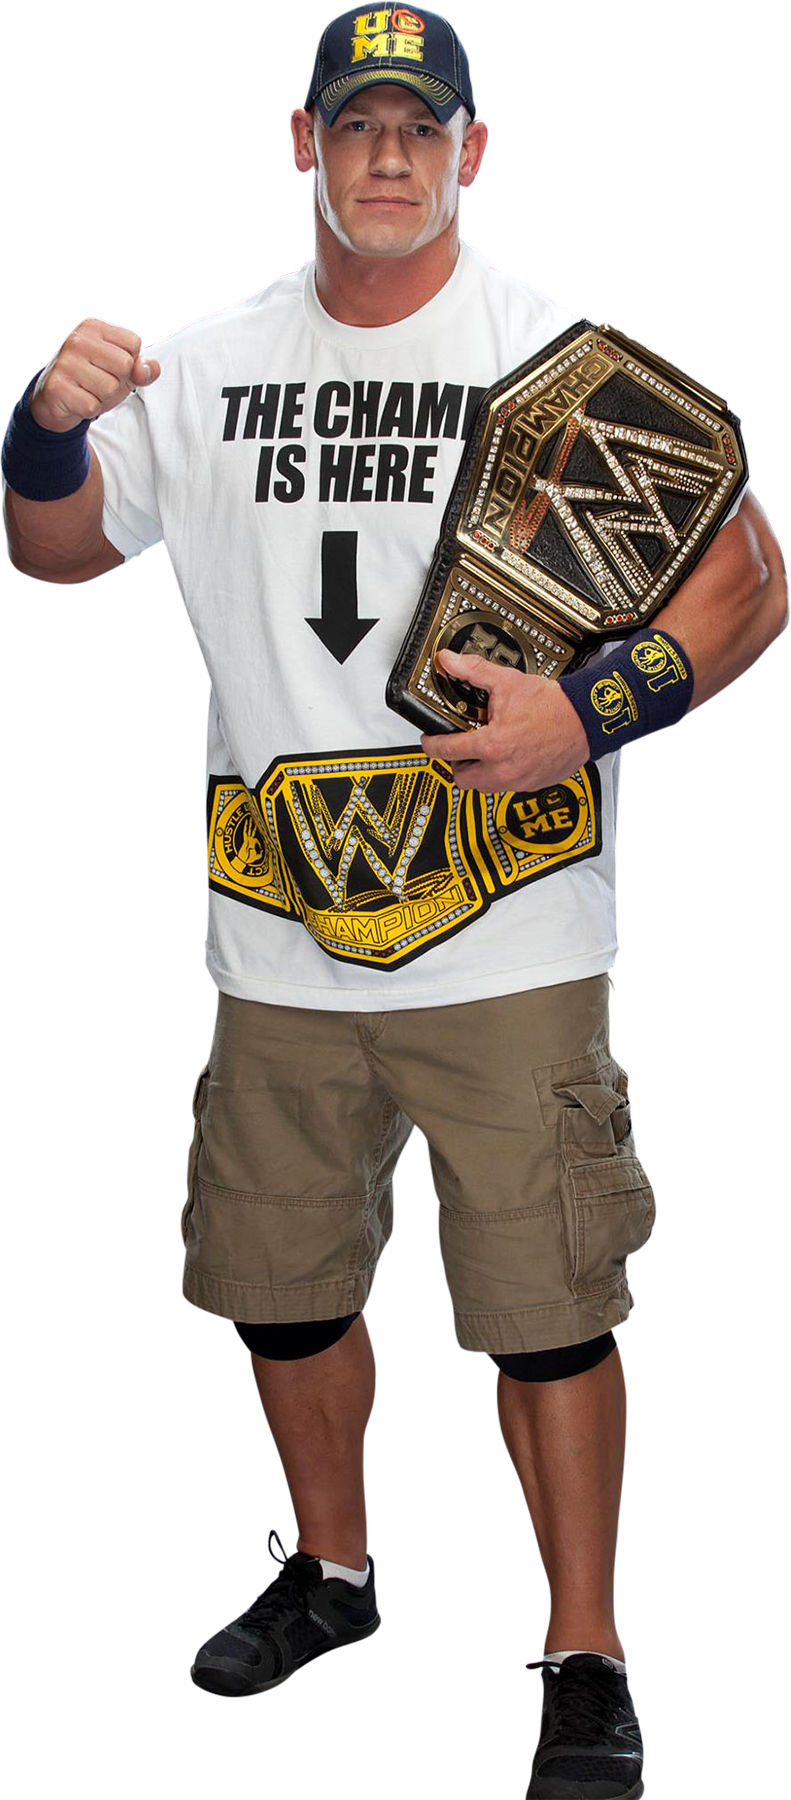 Wwe Cena Google Search John Cena Wwe Champion John Cena Wwe Champions